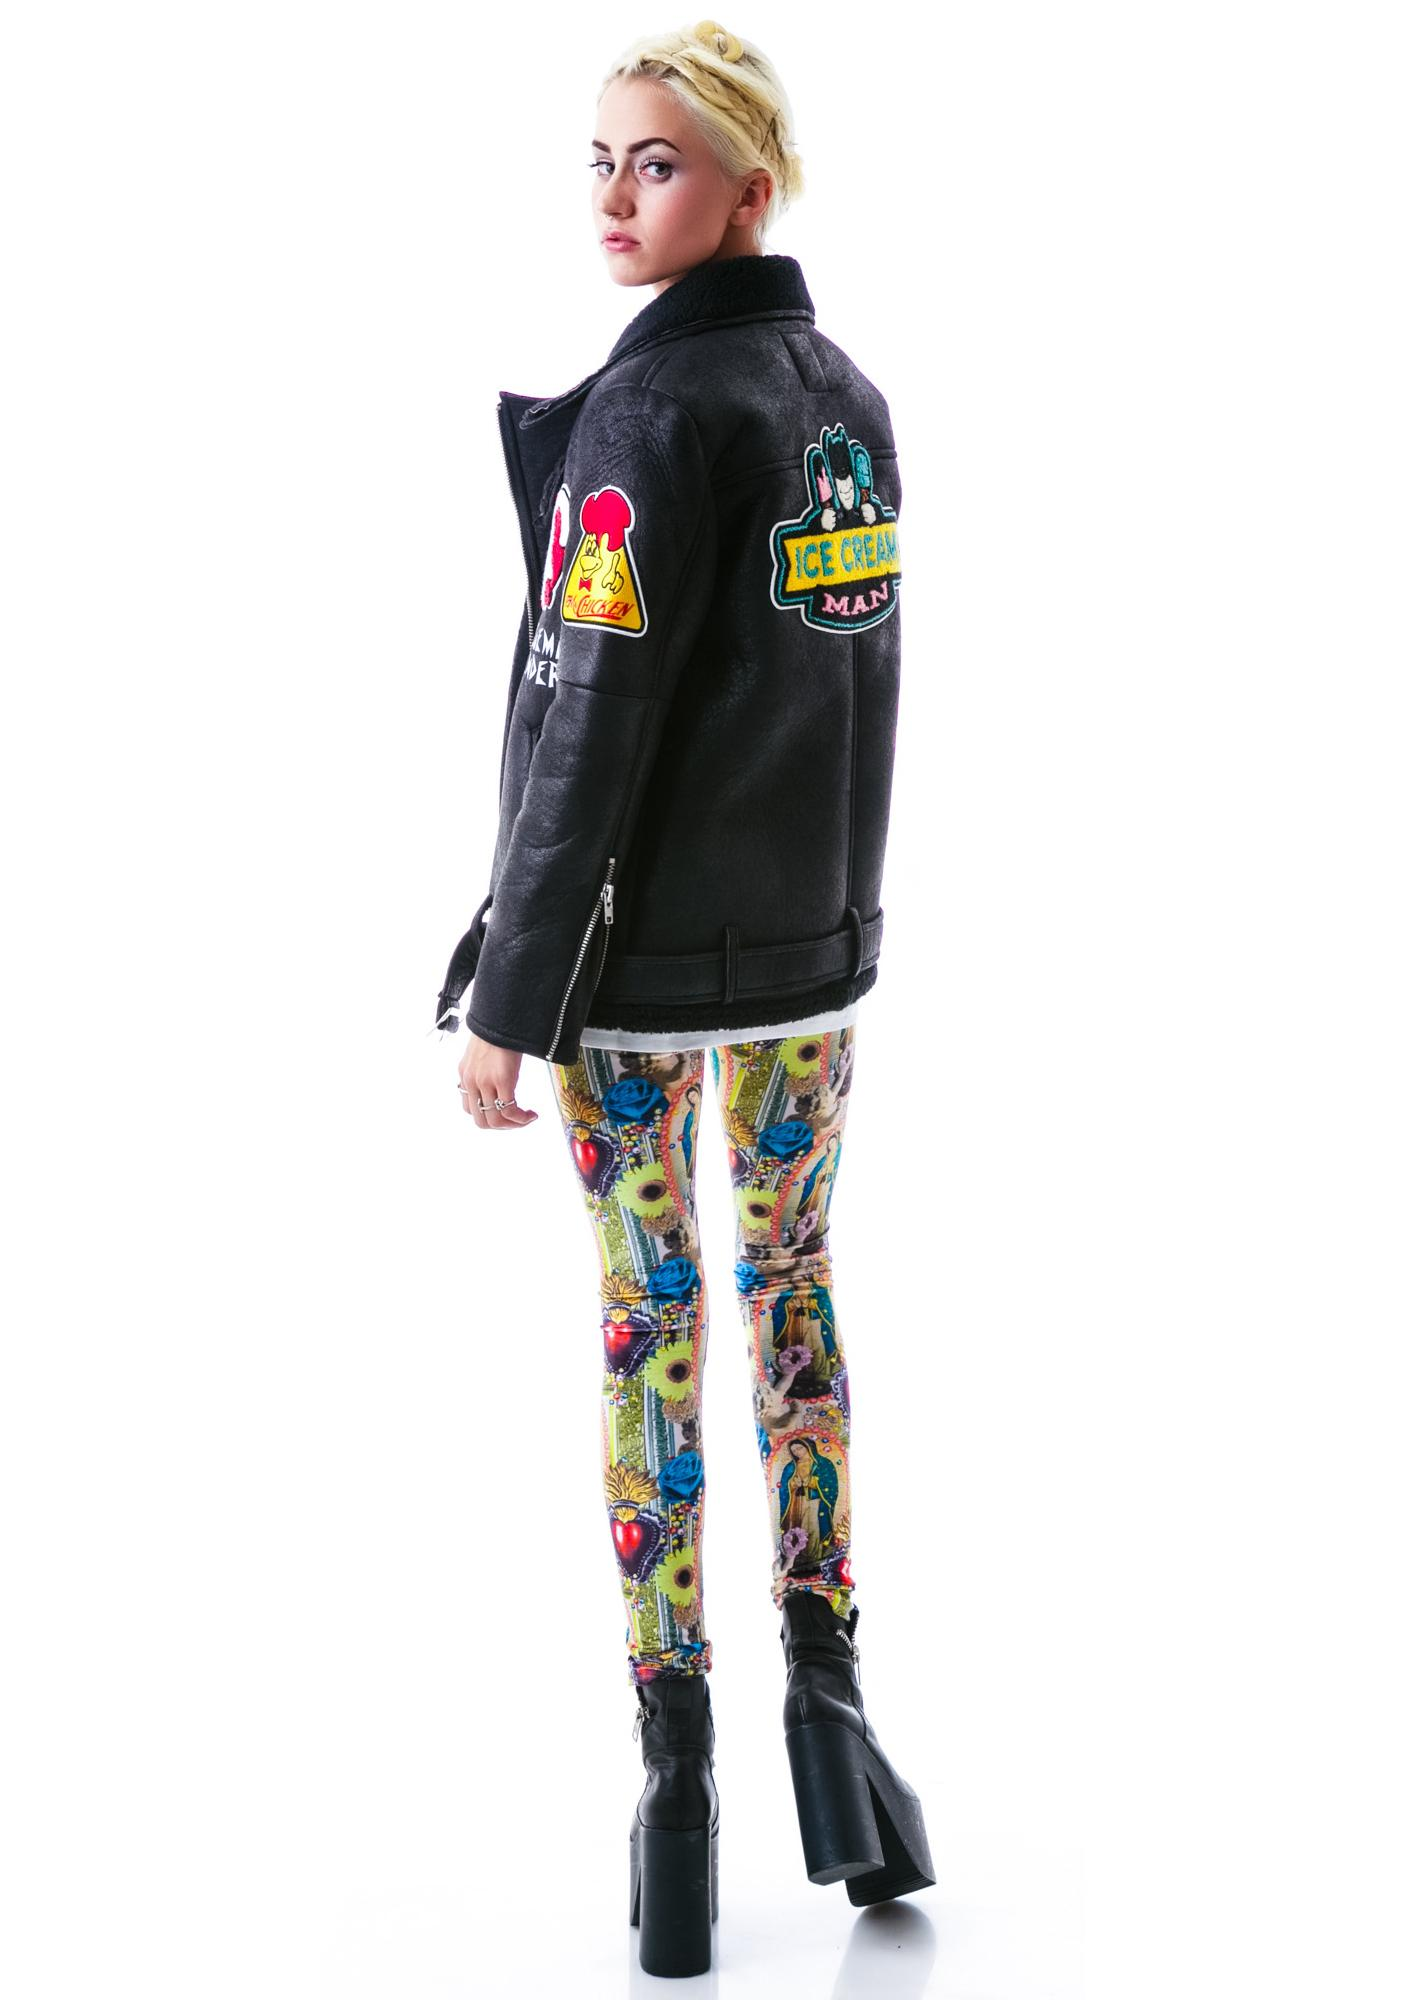 Halfman Romantics Hot Dogs Bomber Jacket